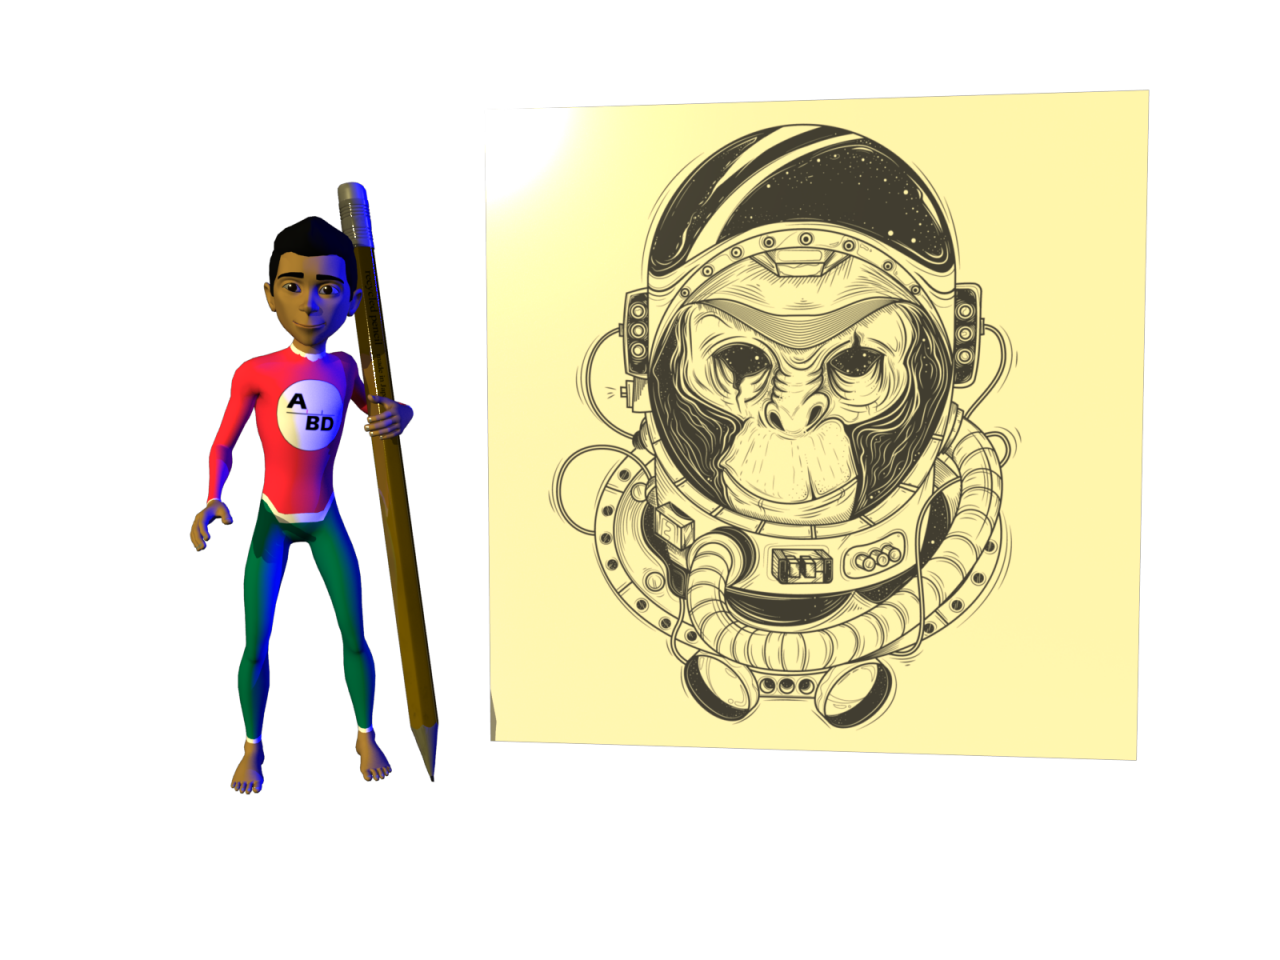 Arts Illustration Animationbd